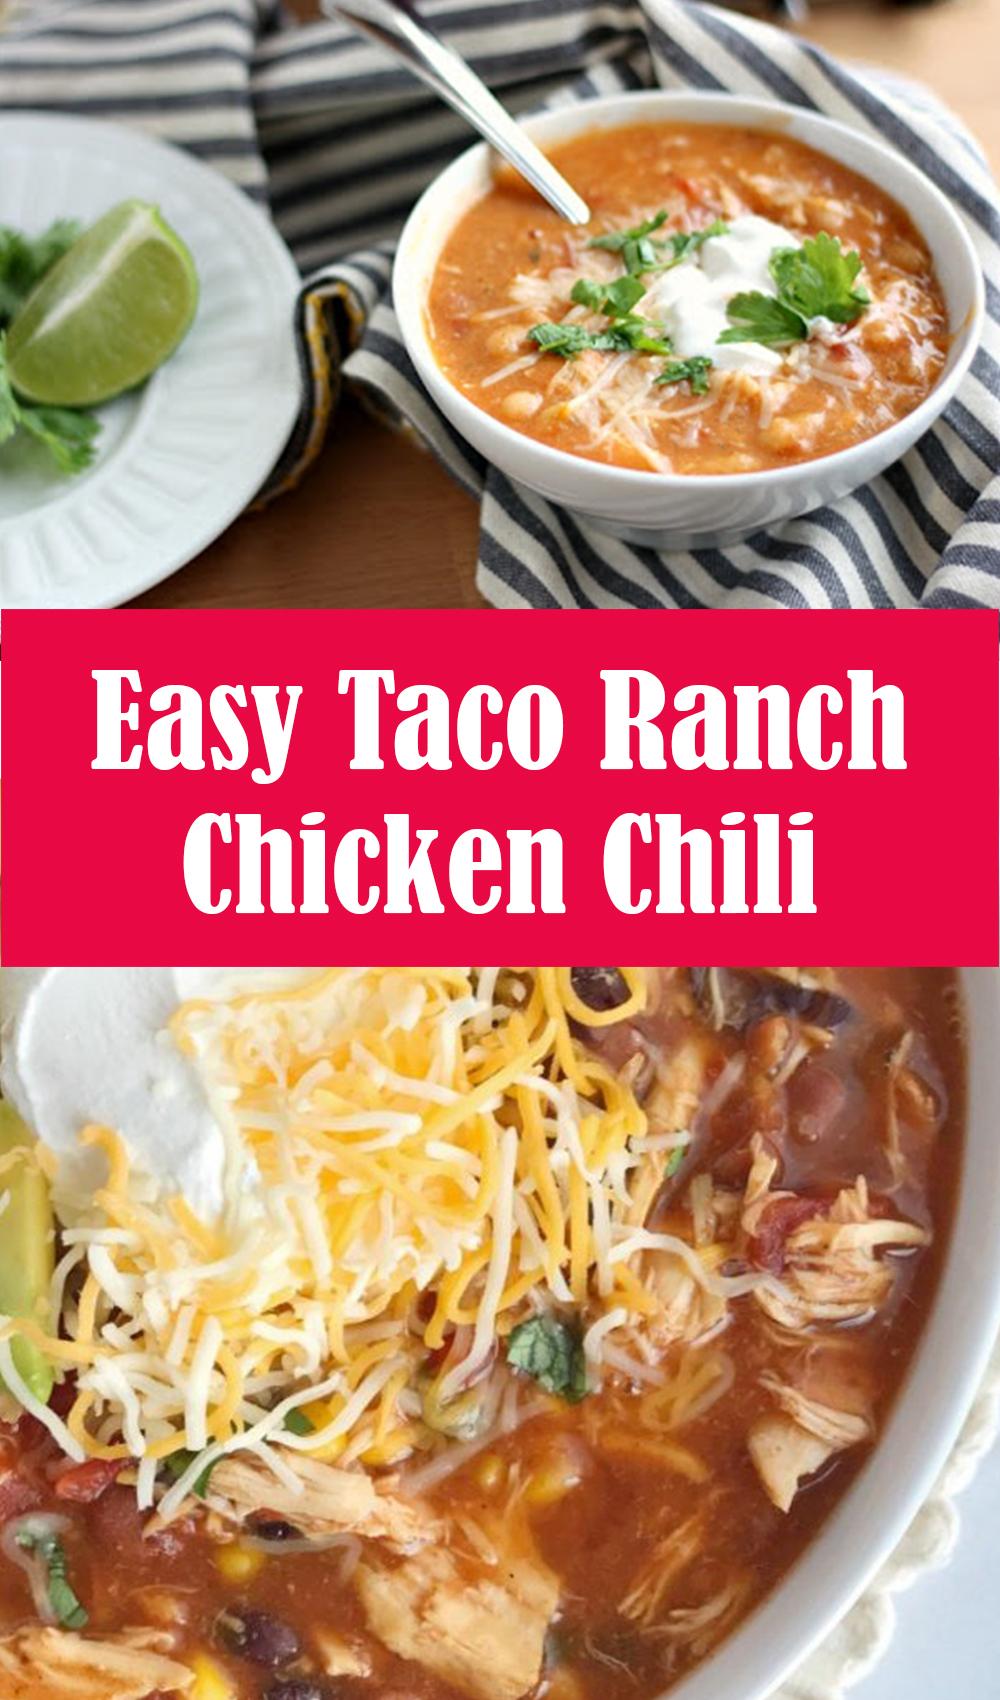 Easy Taco Ranch Chicken Chili